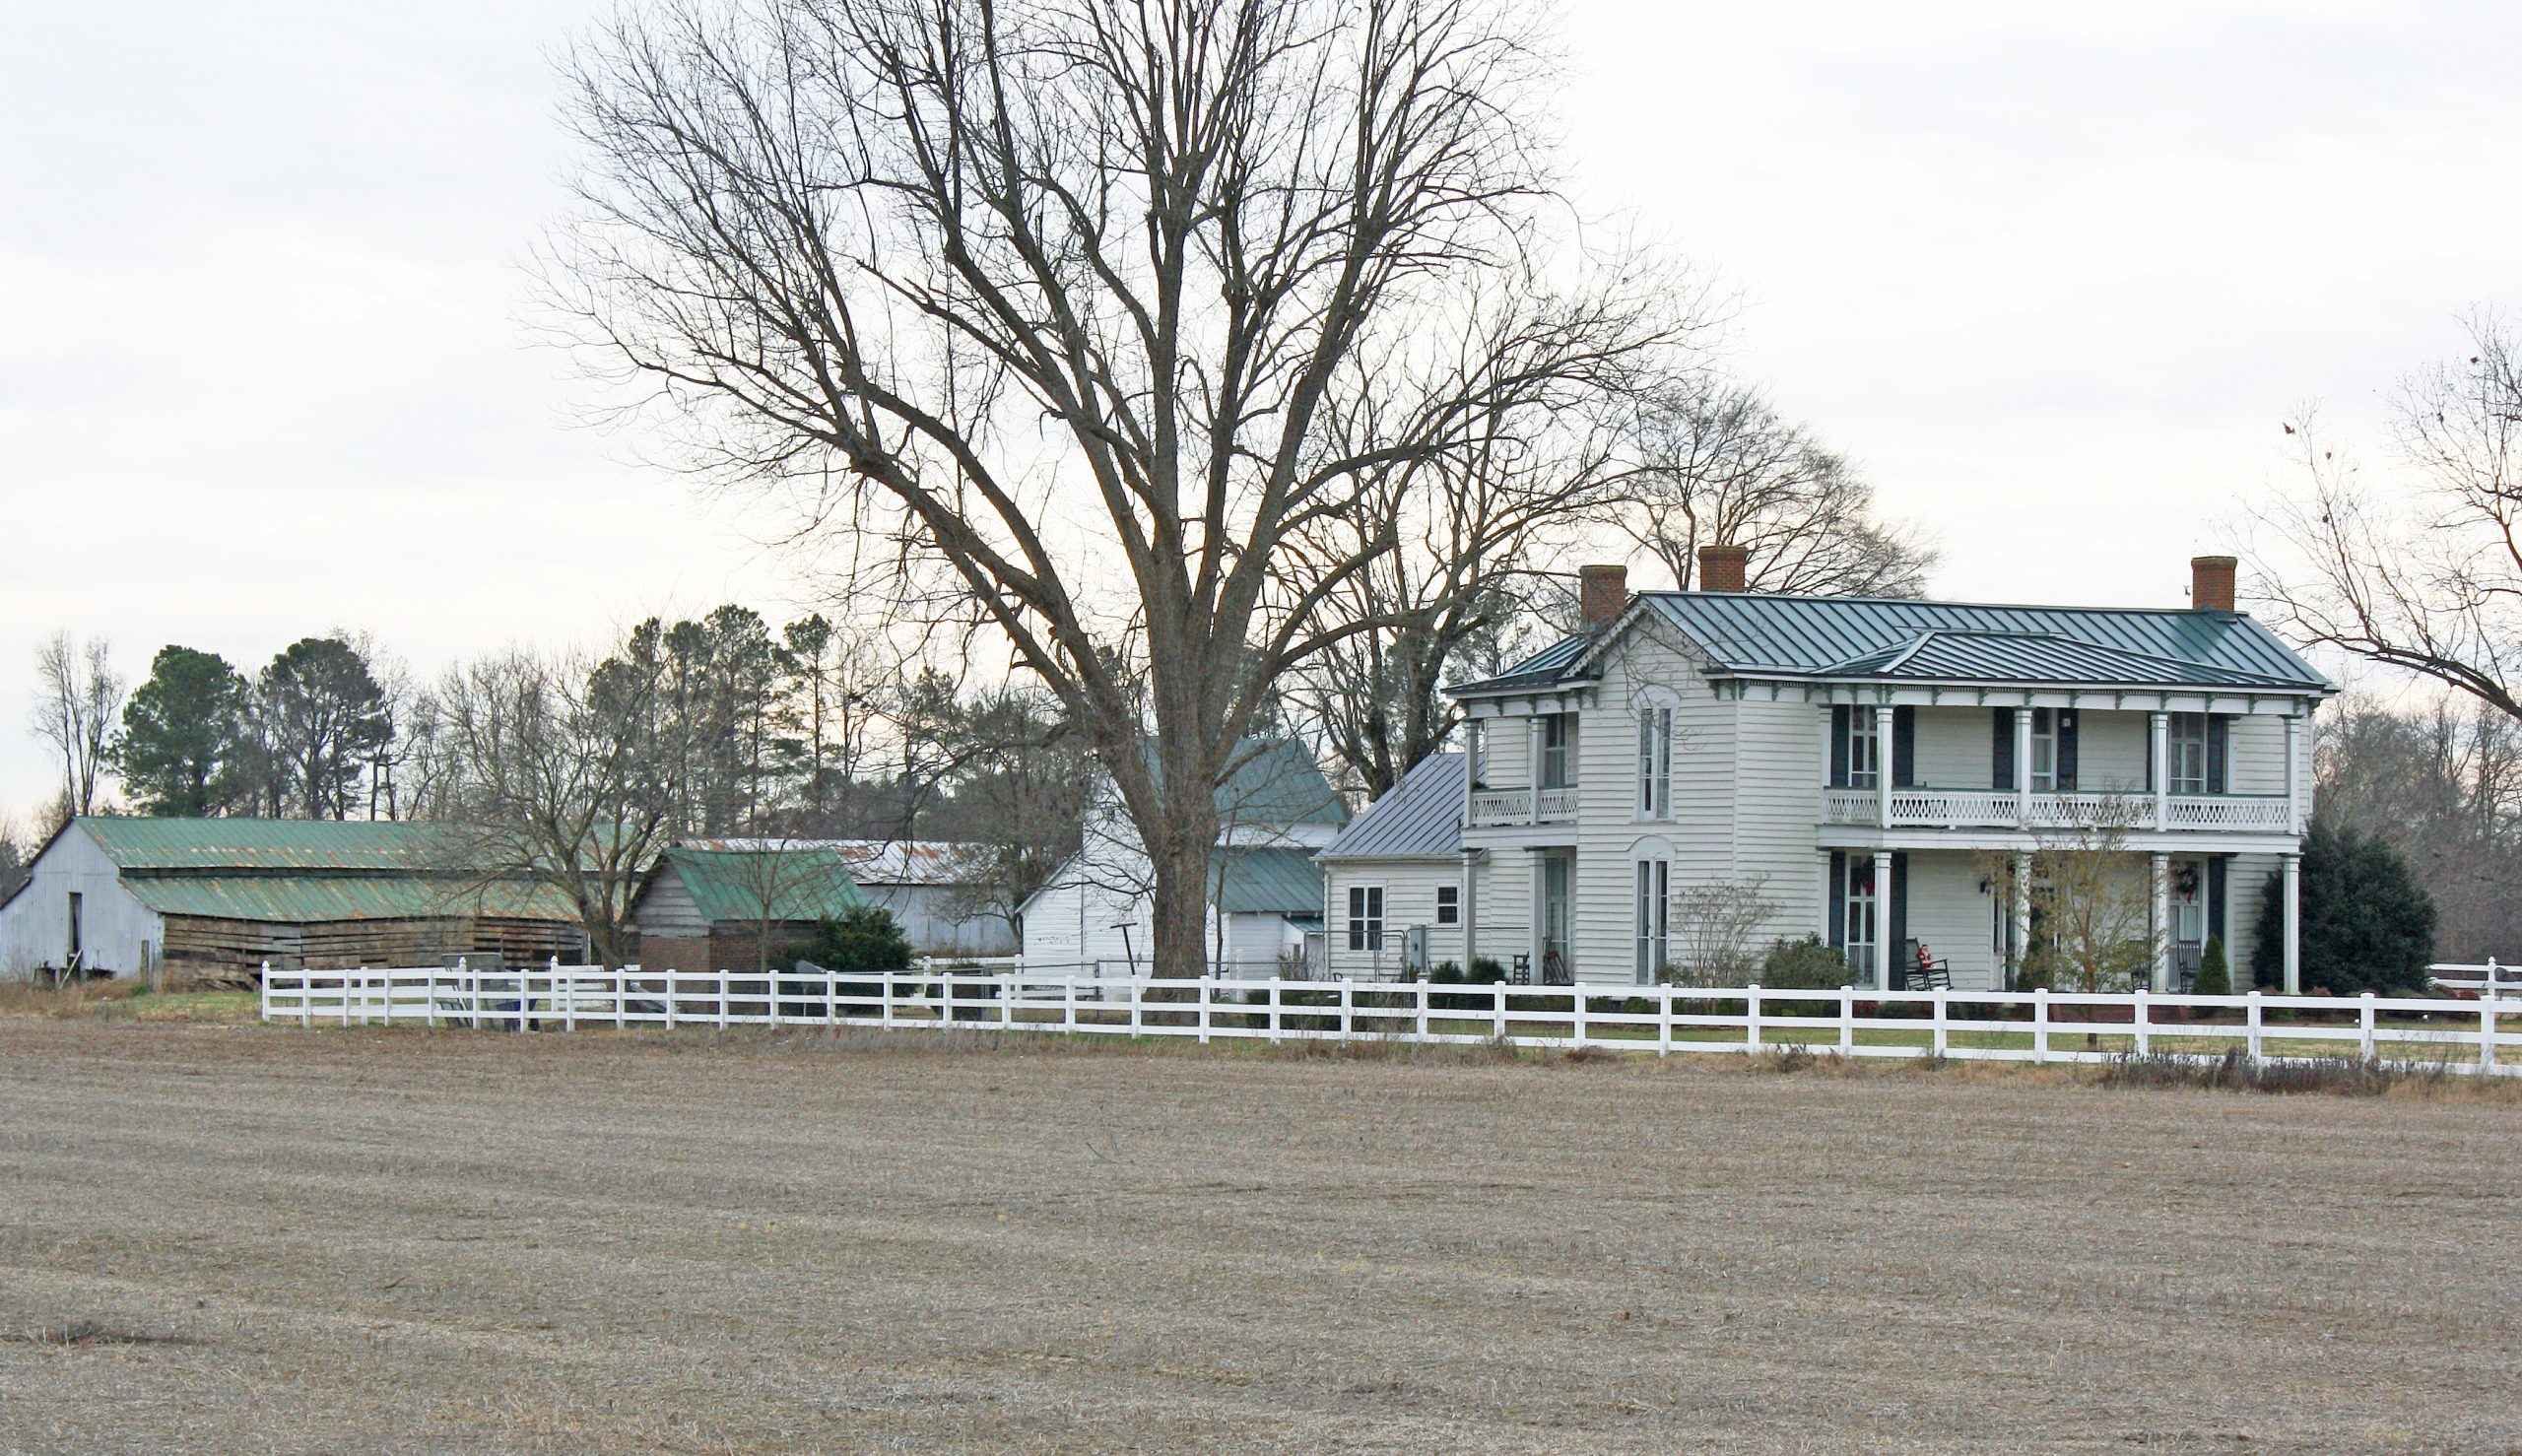 Simmons-Sebrell-Camp House